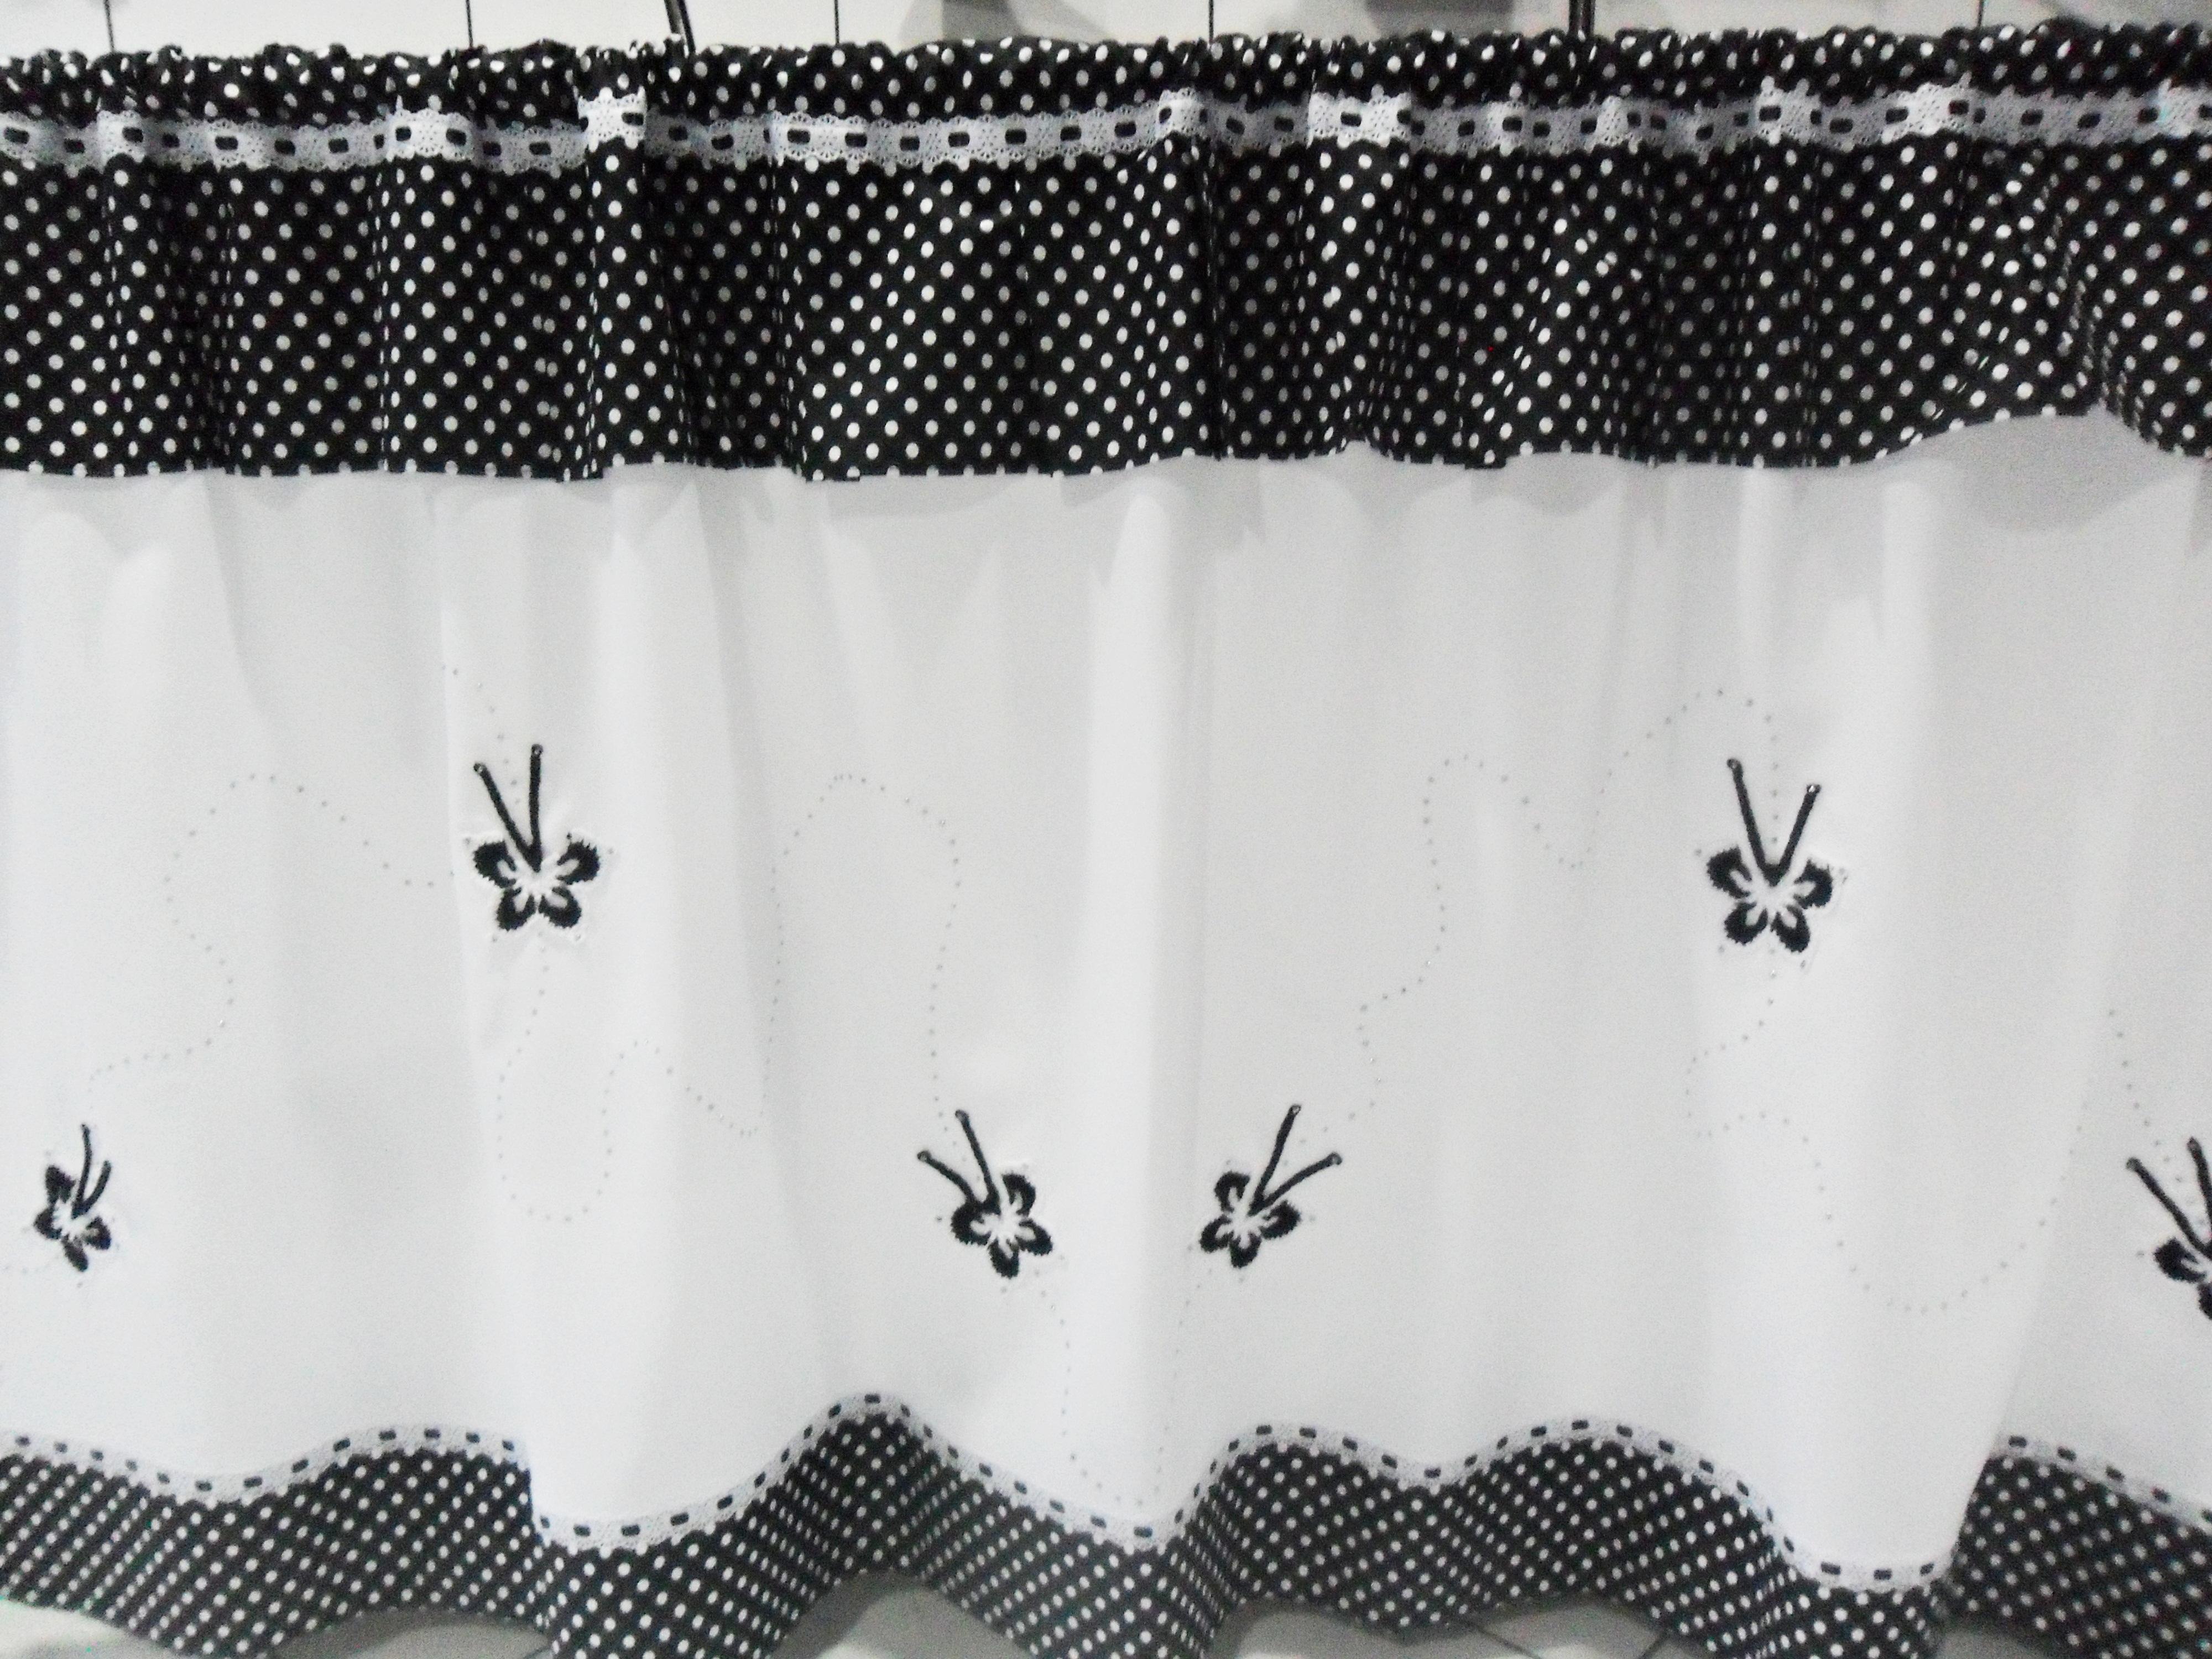 Cortina Preto E Branco Ou Escolha Cores No Elo7 Croch Carioca